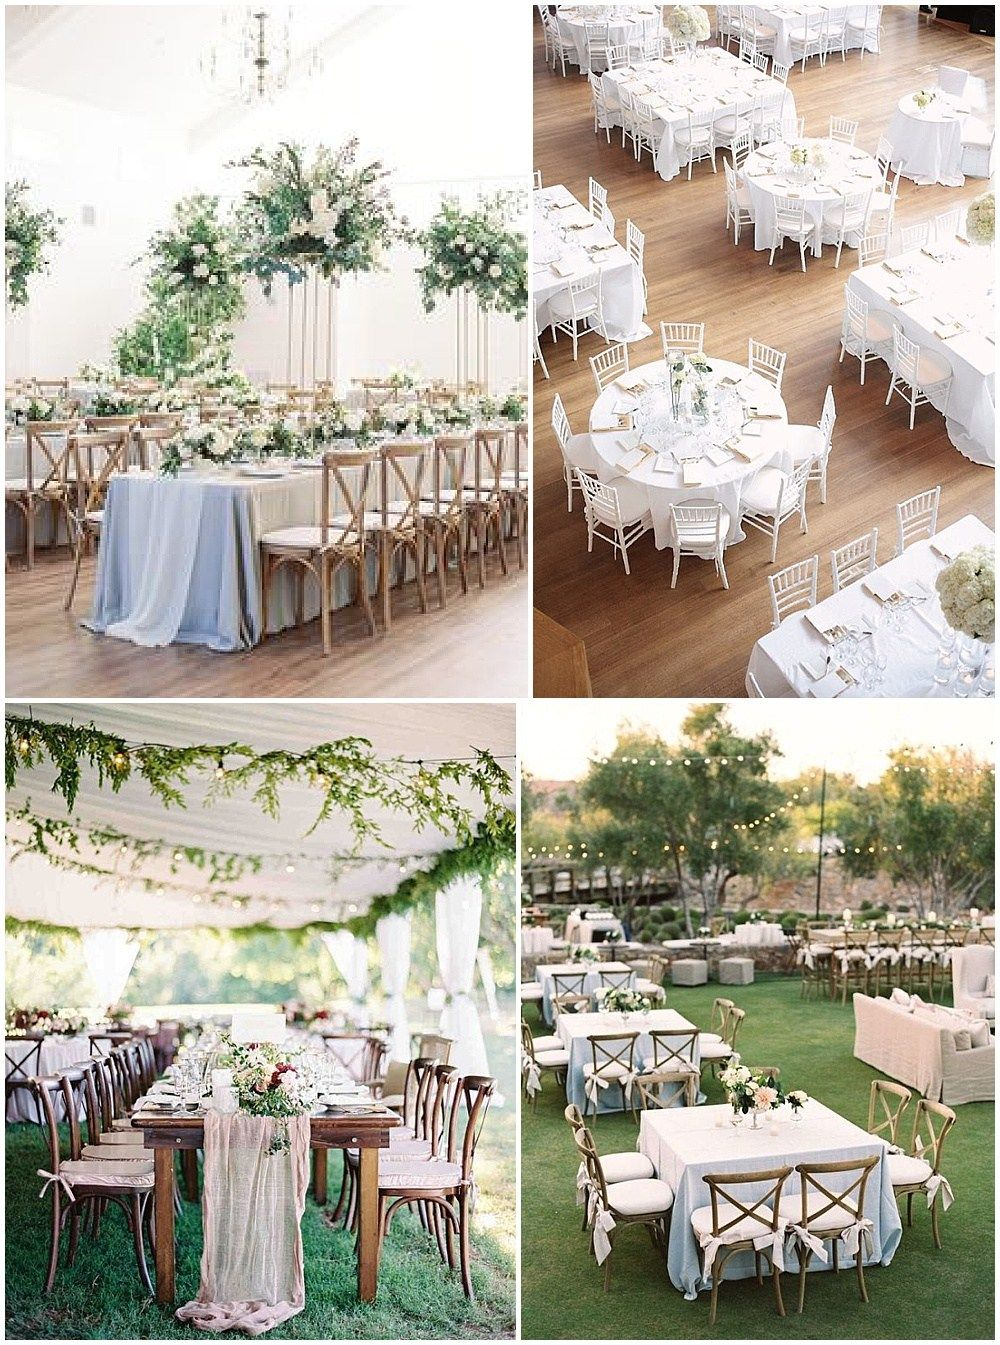 Wedding Reception Decor Ideas That Make A Big Impact Table Ideas